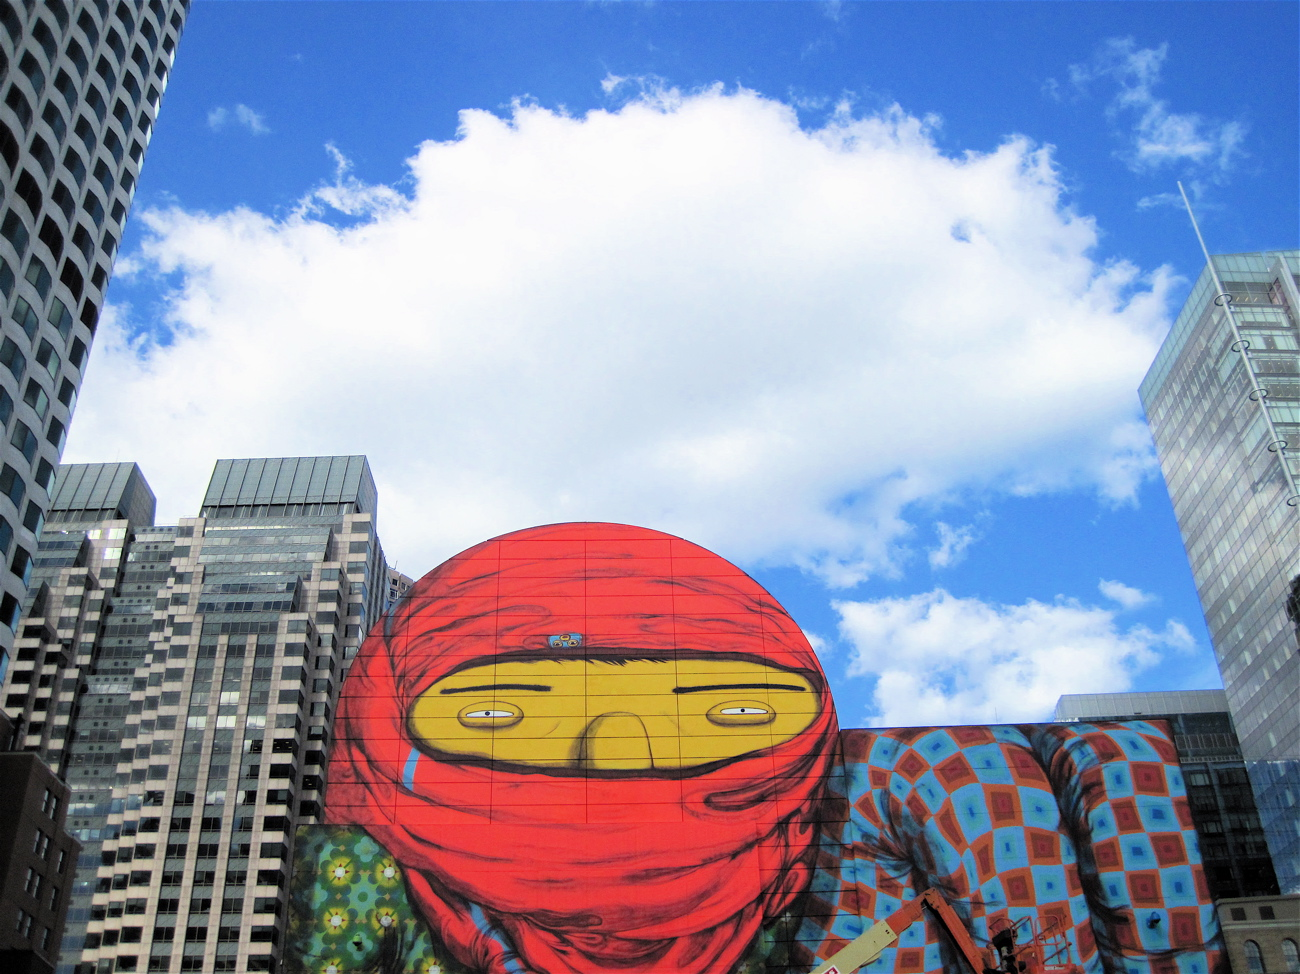 dewey square mural 2016 mehdi ghadyanloo ghadyy twitter